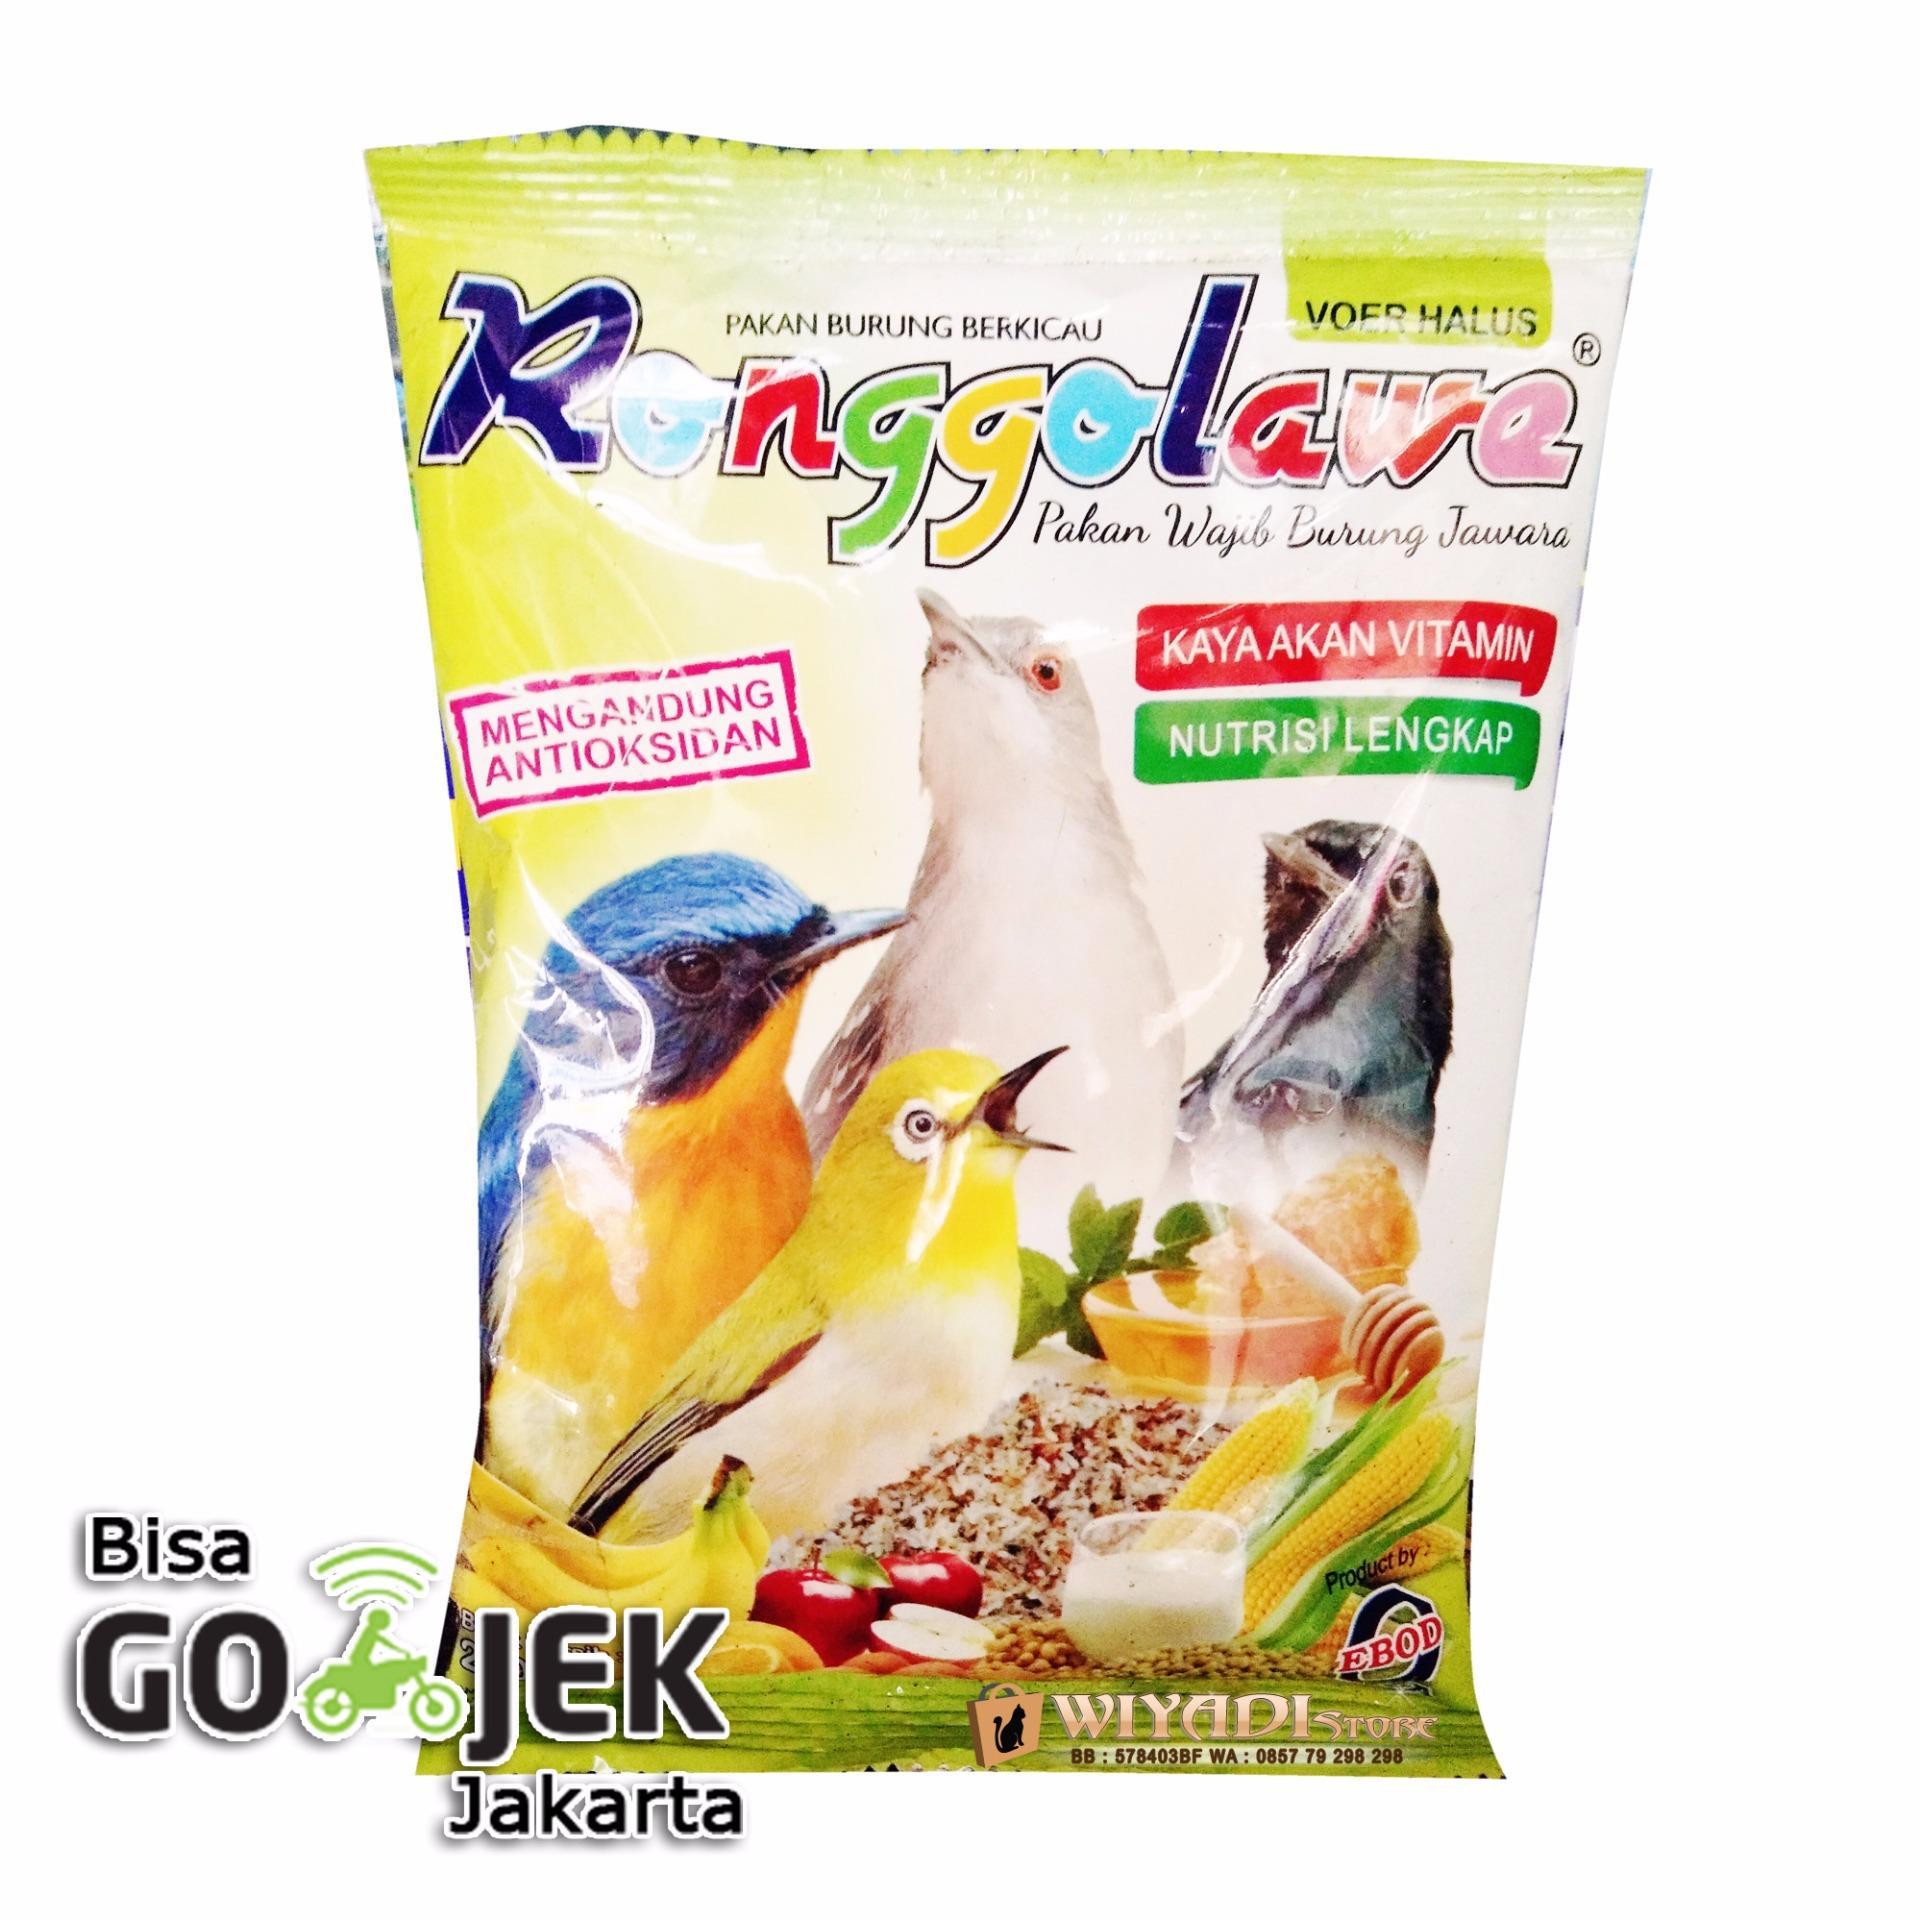 Flash Sale WiyadiStore - Pur Pakan Burung Pleci Prenjak Ciblek Glatik - Ronggolawe Voer Halus